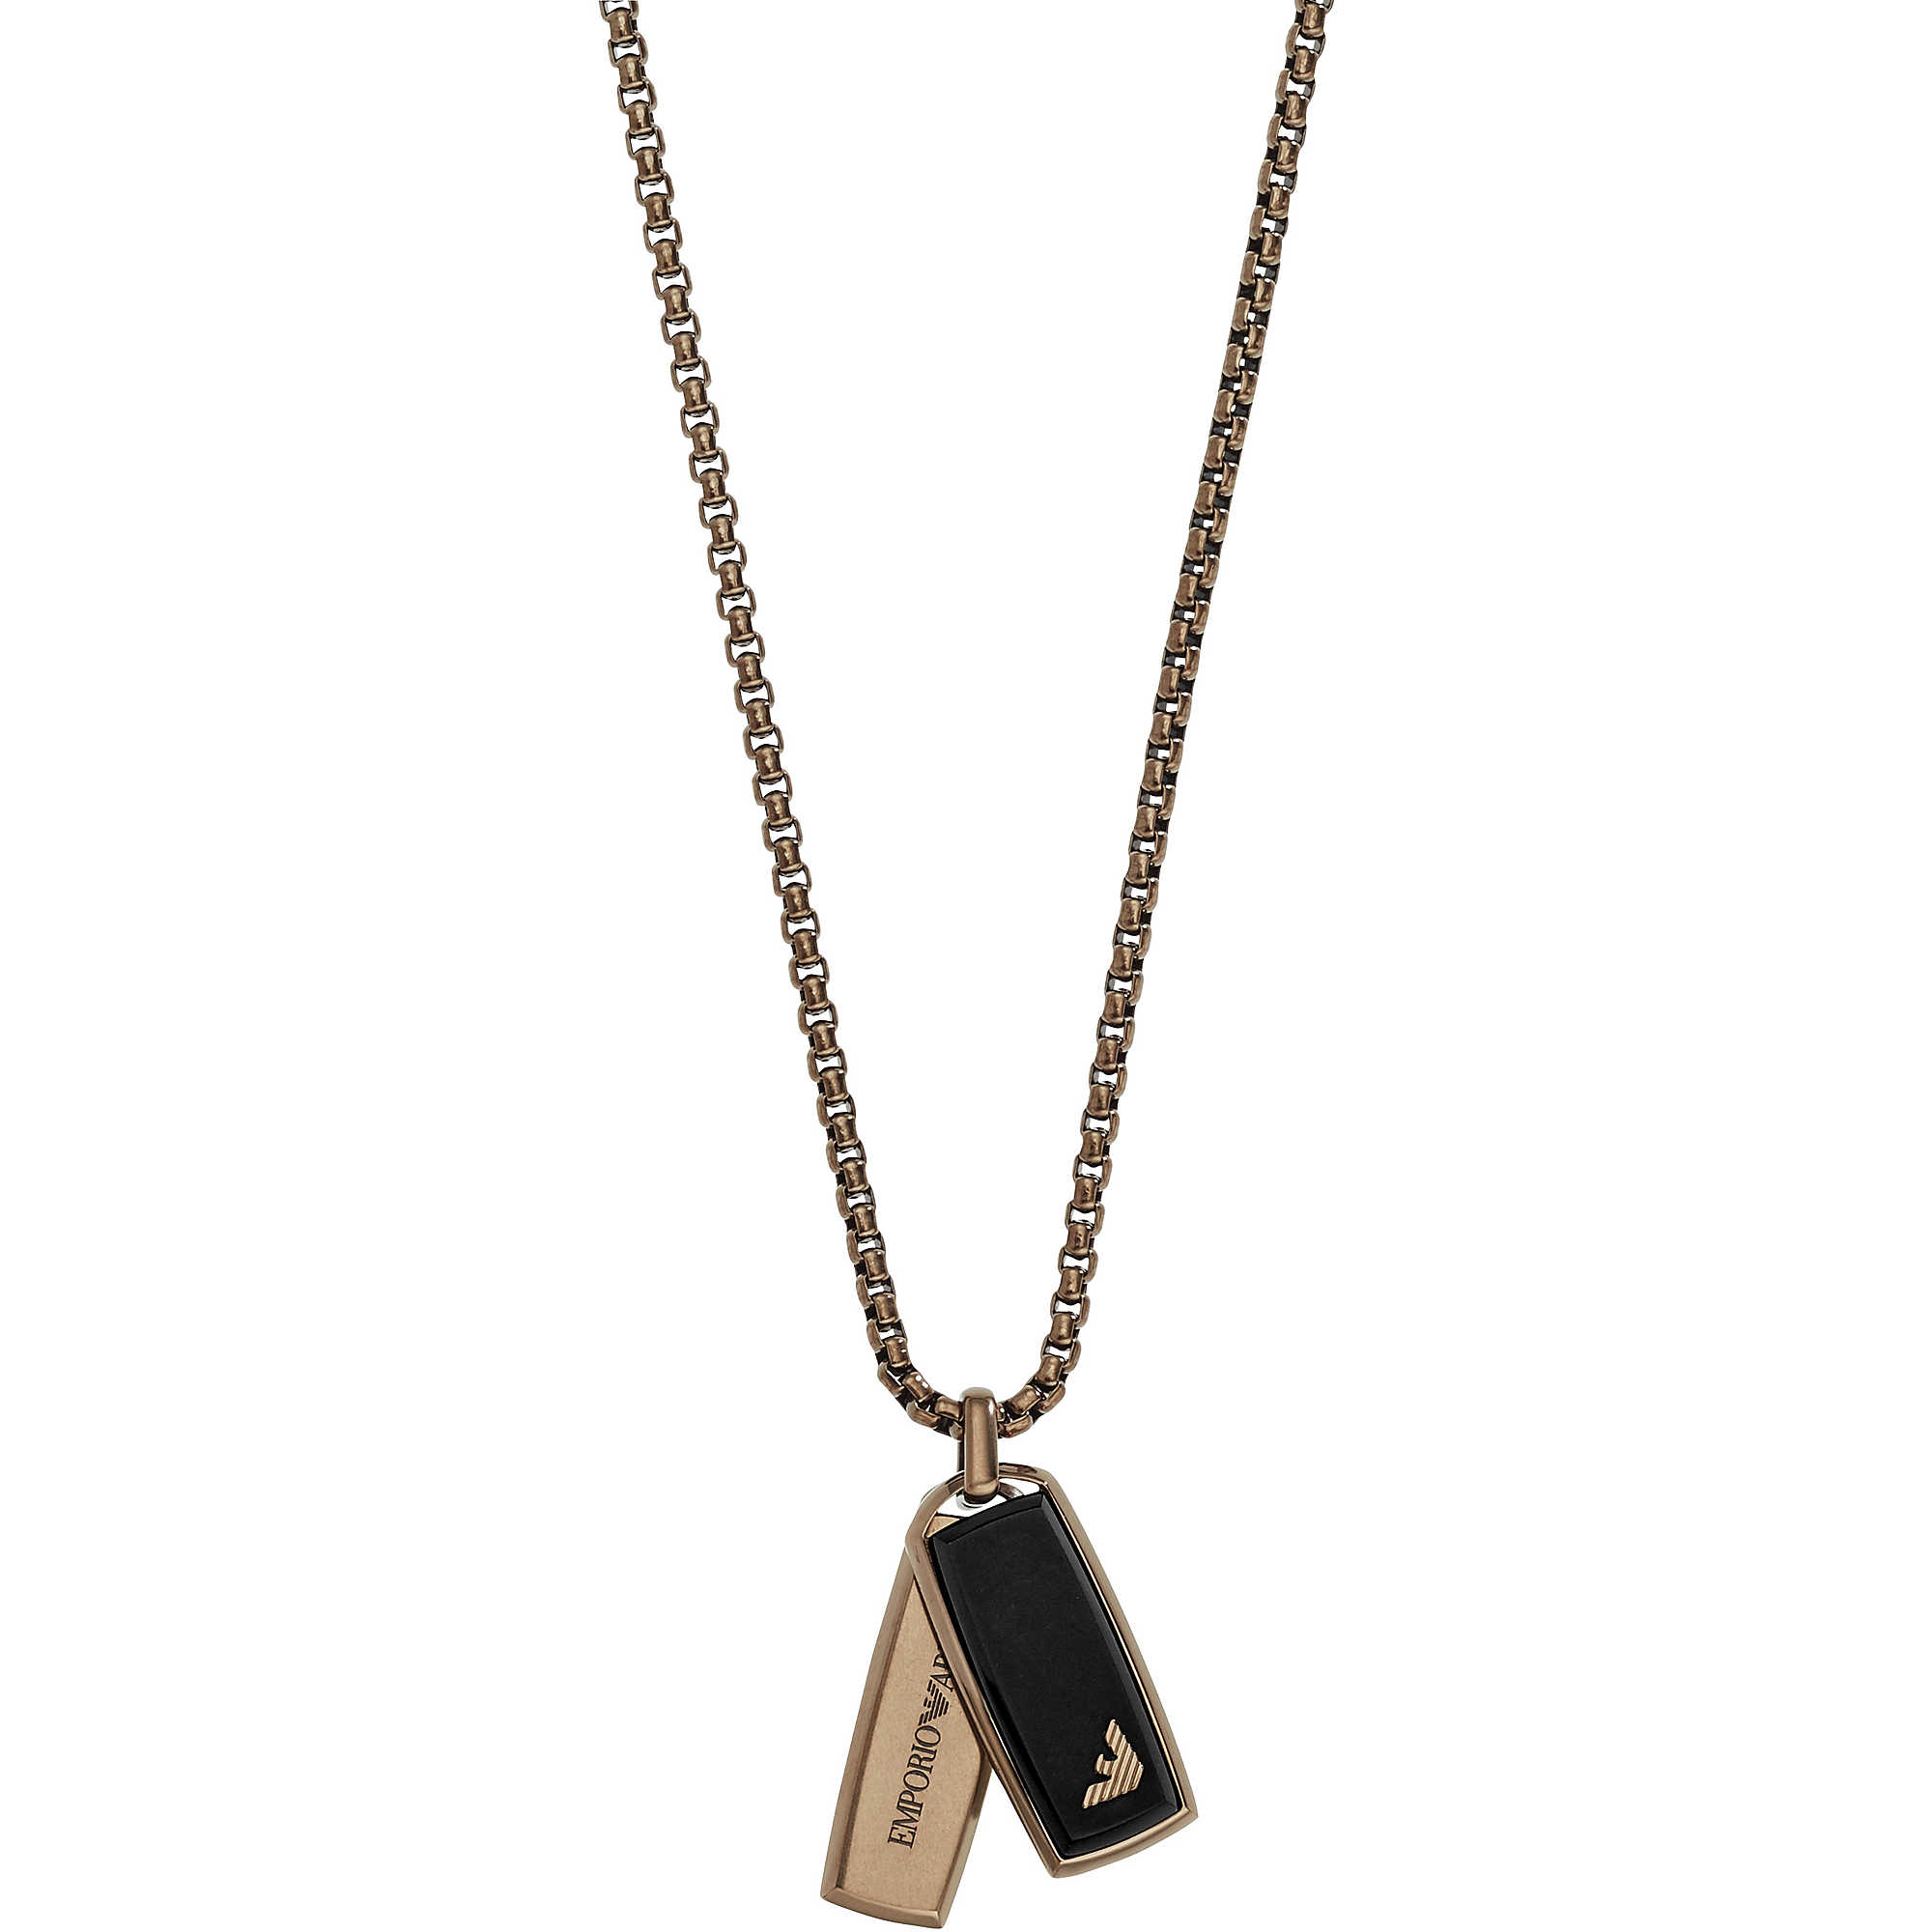 quartz bonoculo ferrari and karat kt gold necklaces bergsoe rutile diamonds with necklace